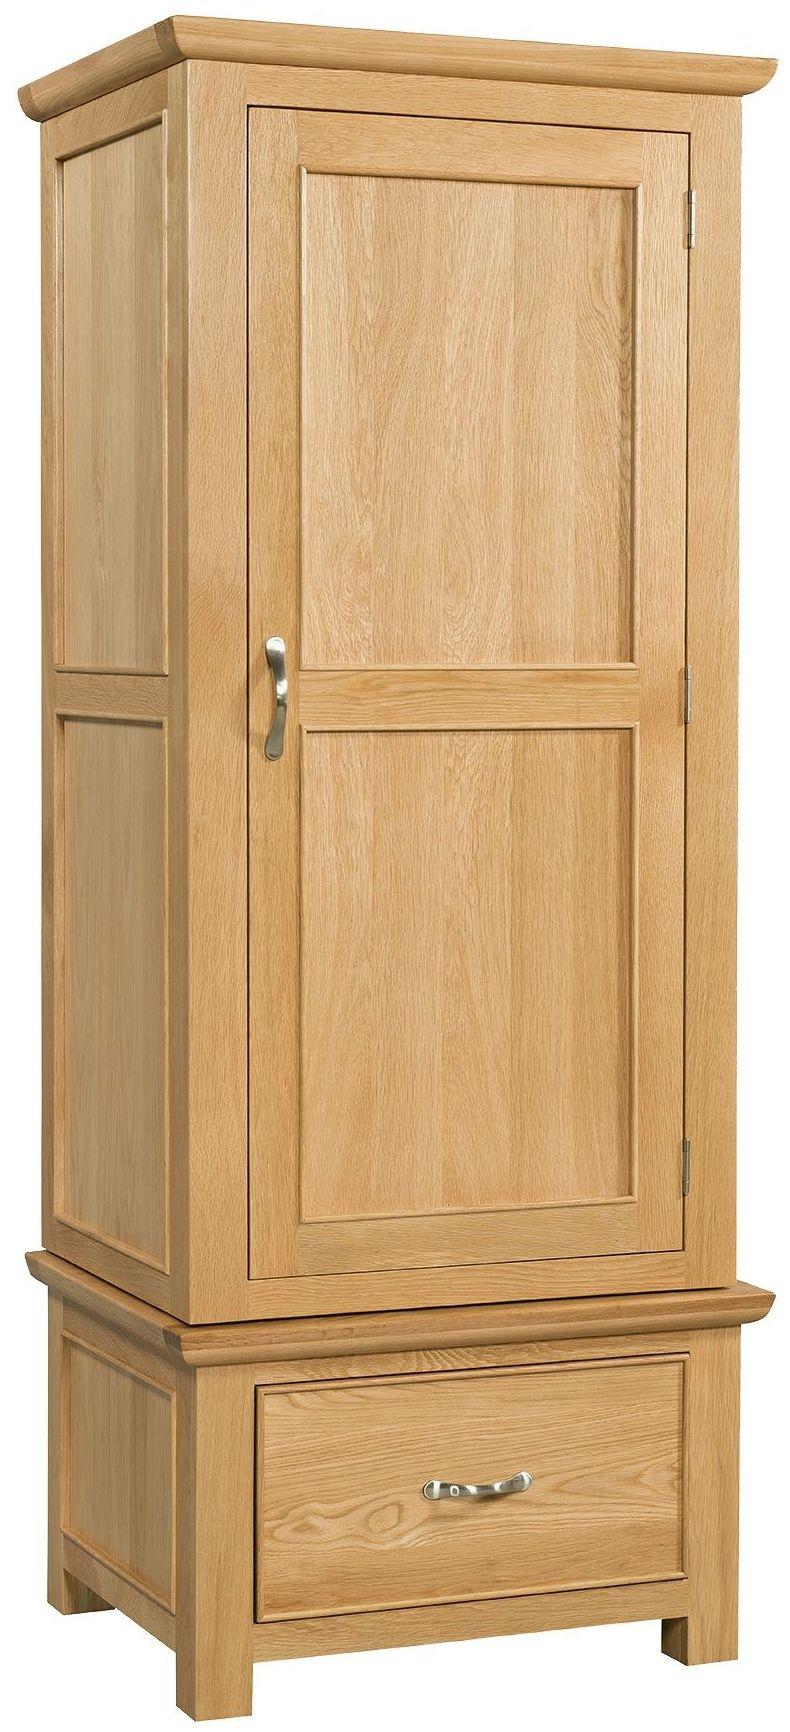 Devonshire Siena Oak 1 Door 1 Drawer Single Wardrobe